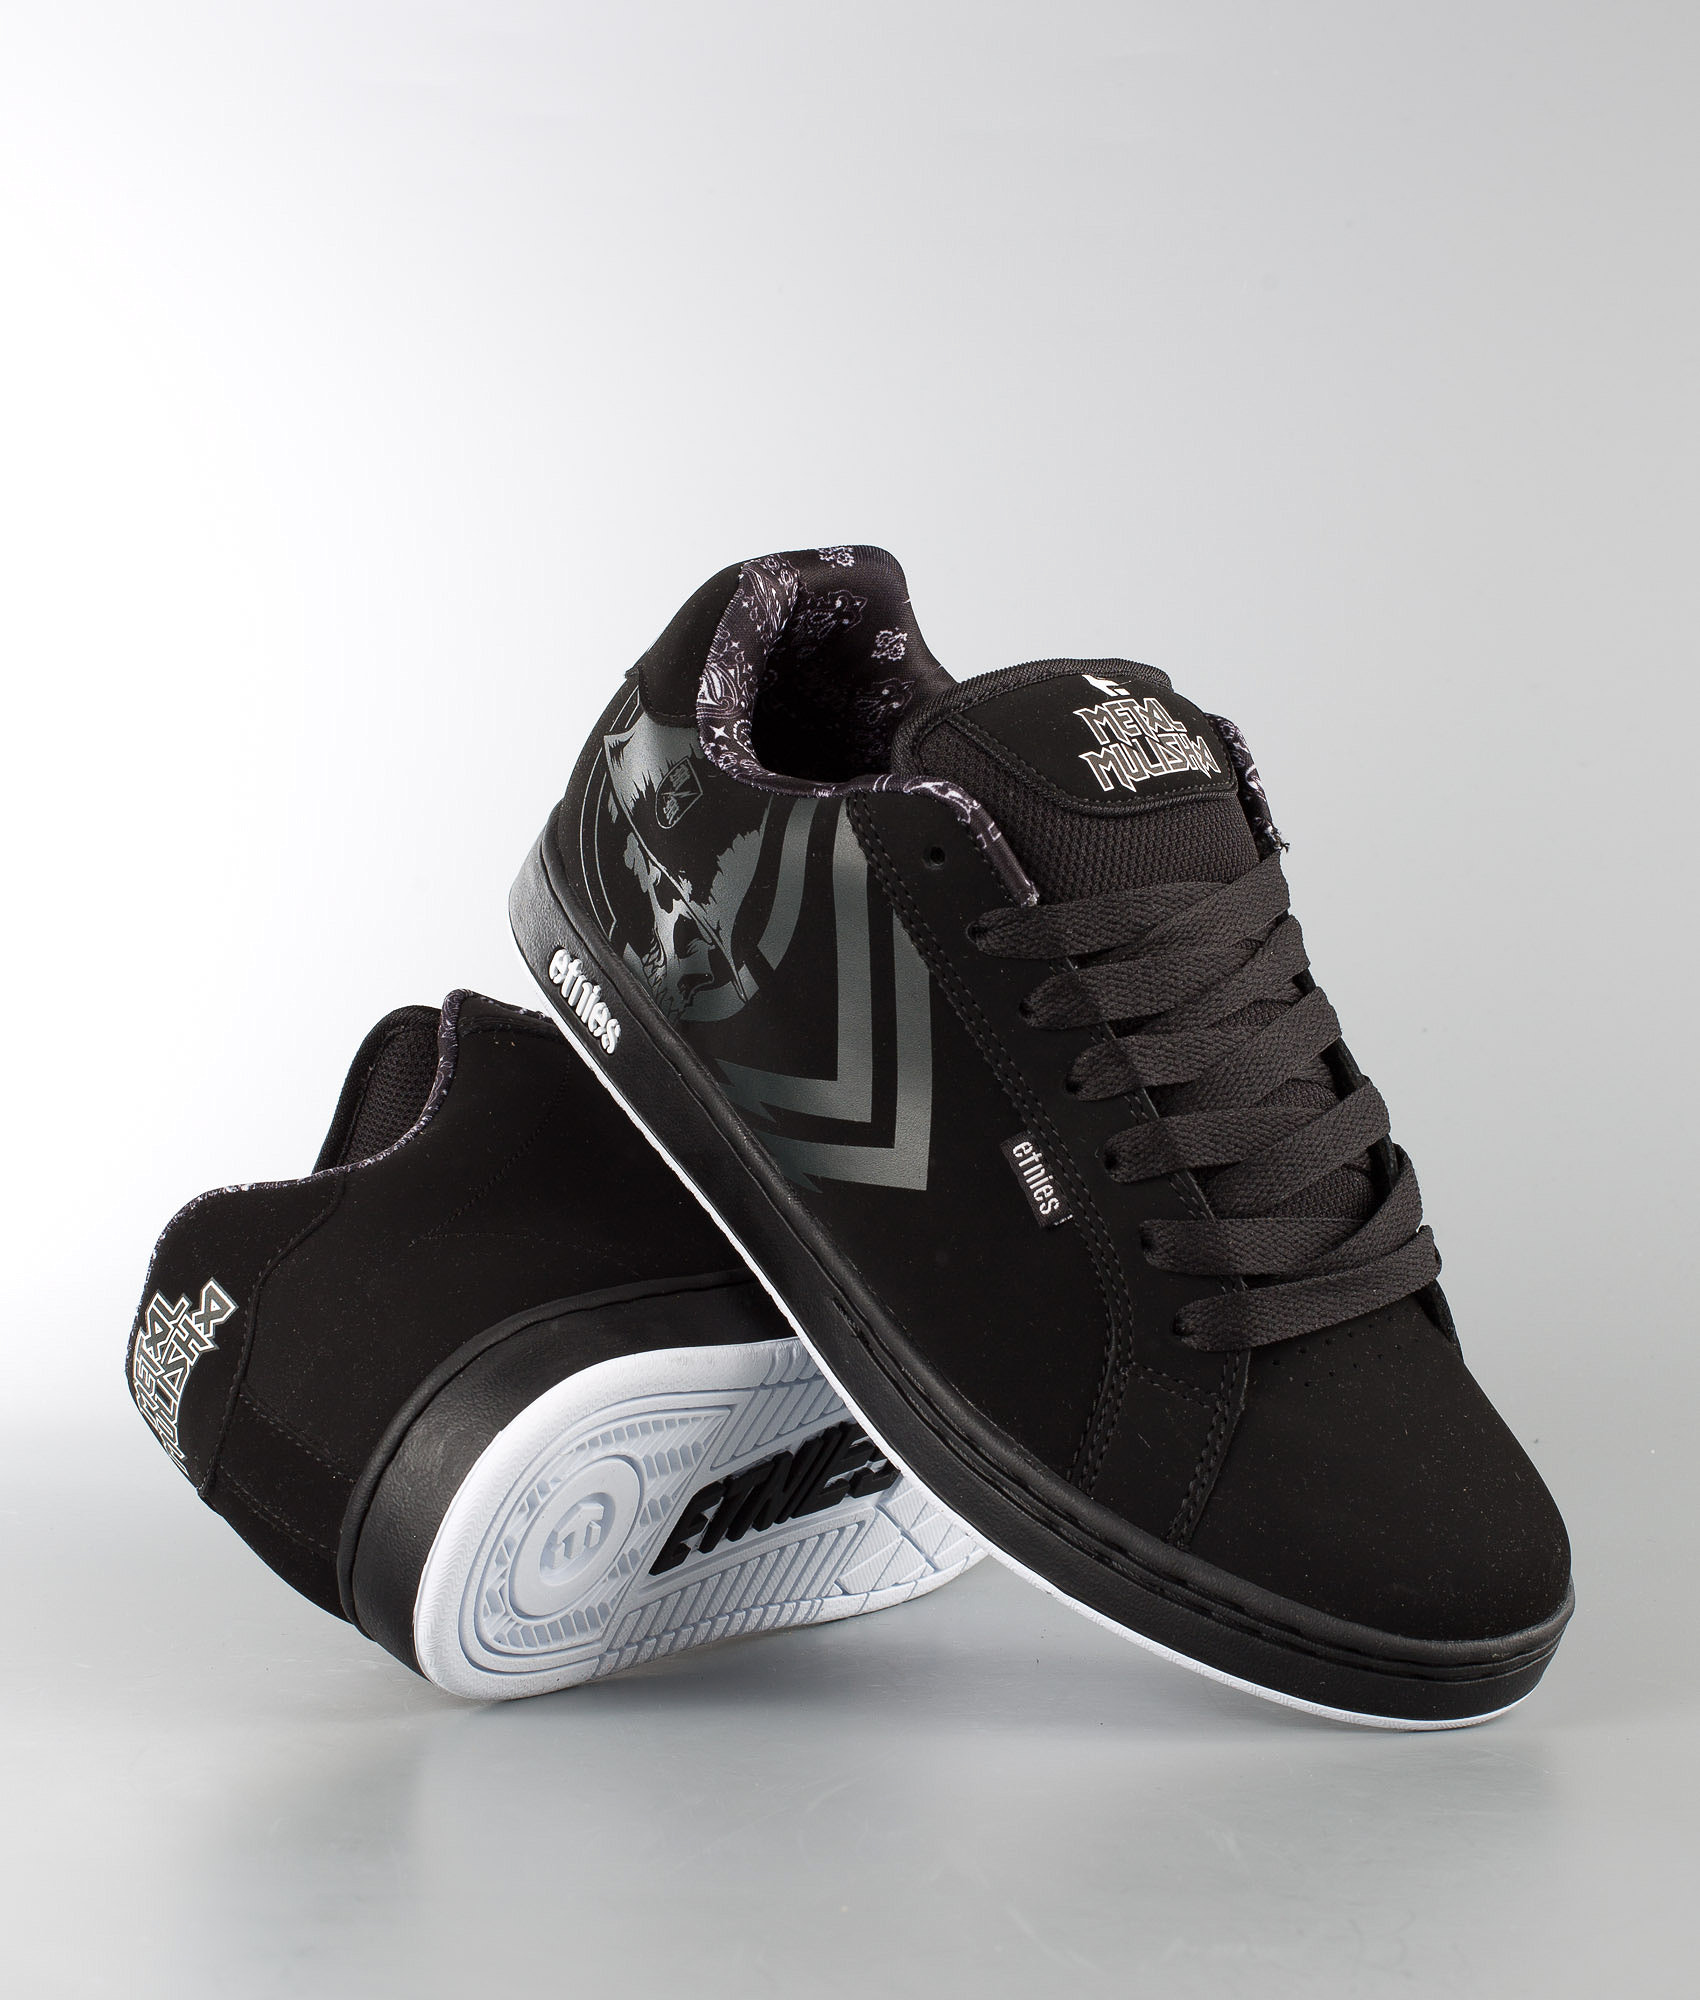 2a4d99a9677 Etnies Metal Mulisha Fader Shoes Black White - Ridestore.com